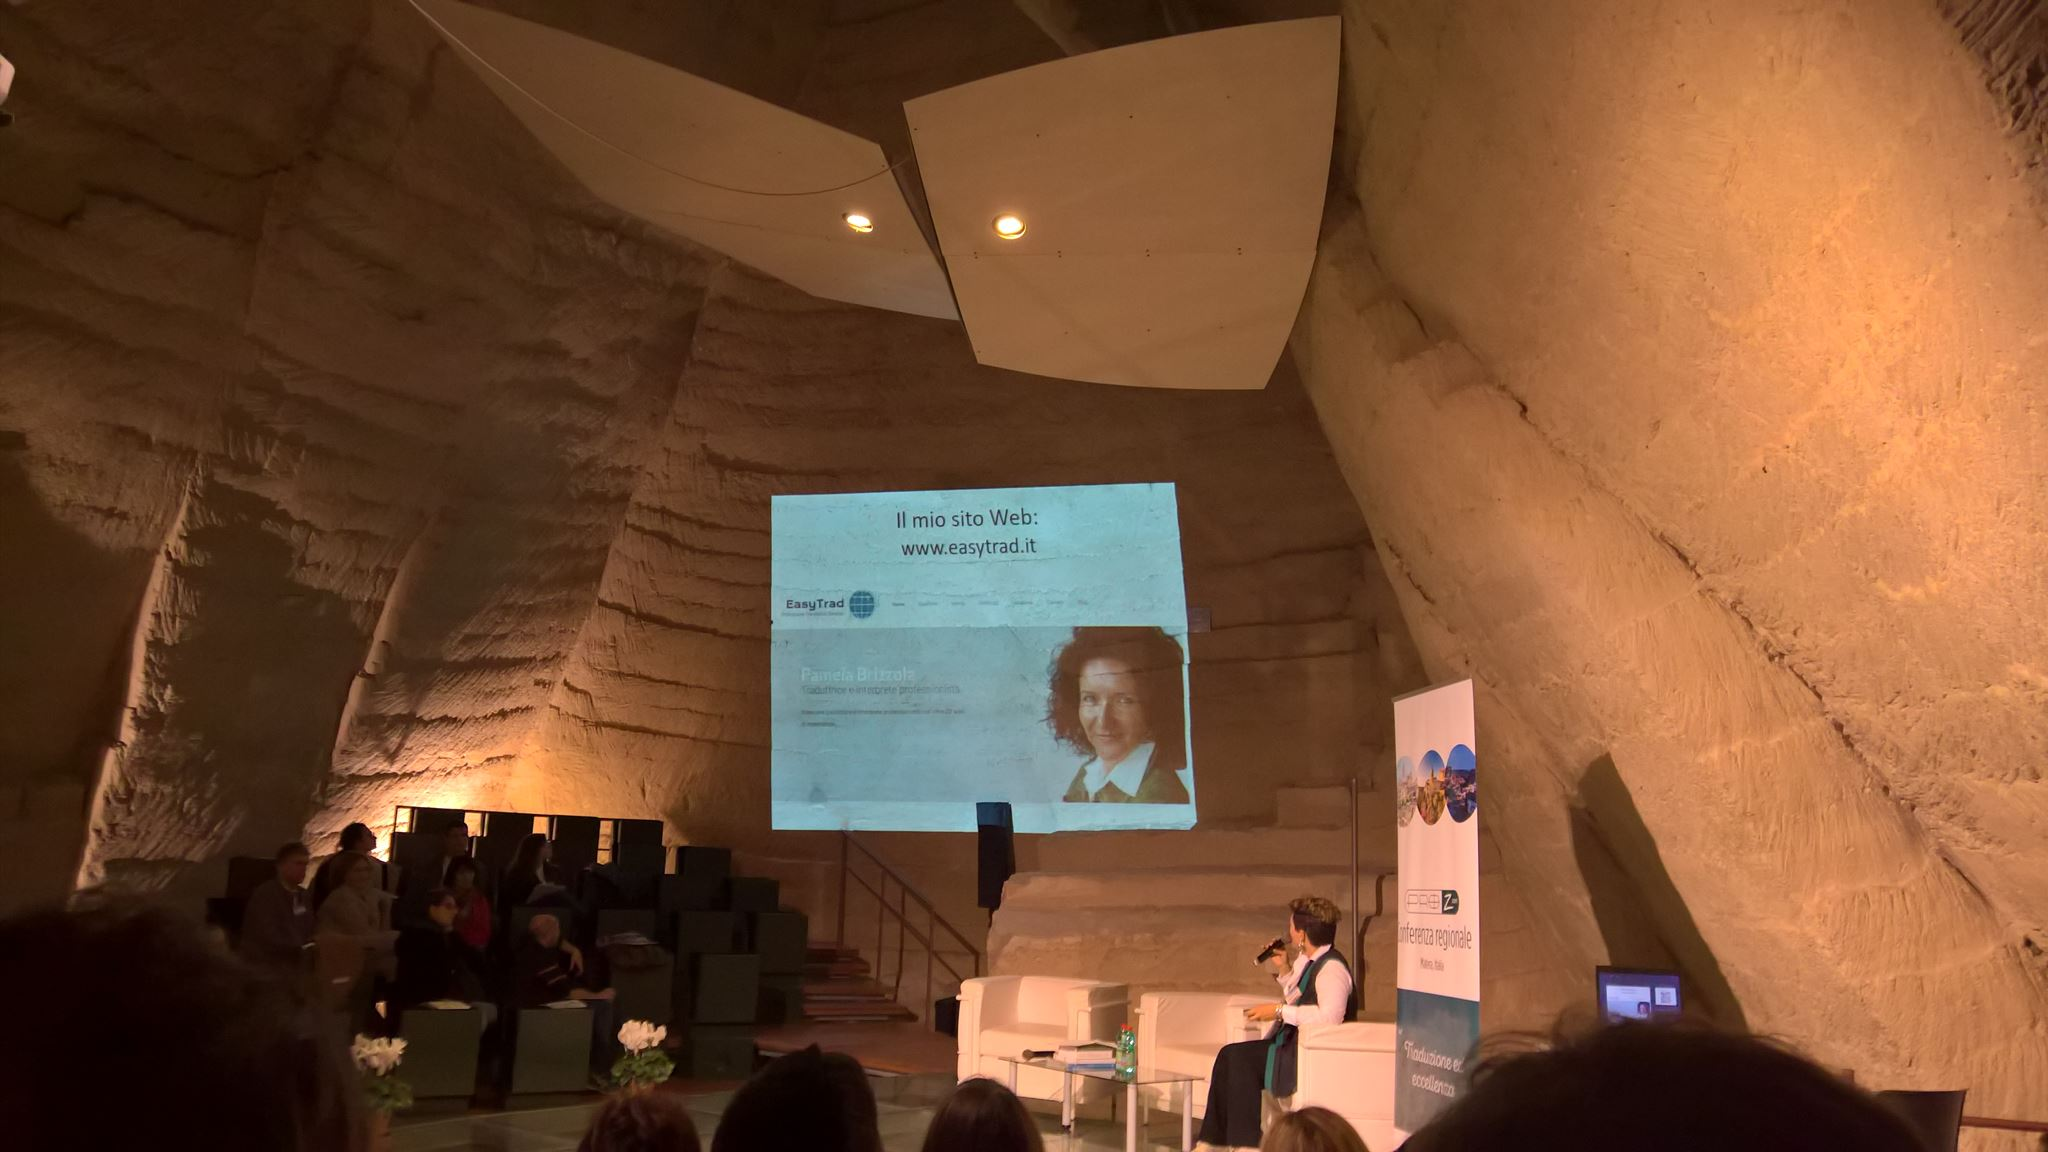 Speaker Conferenza Proz Matera